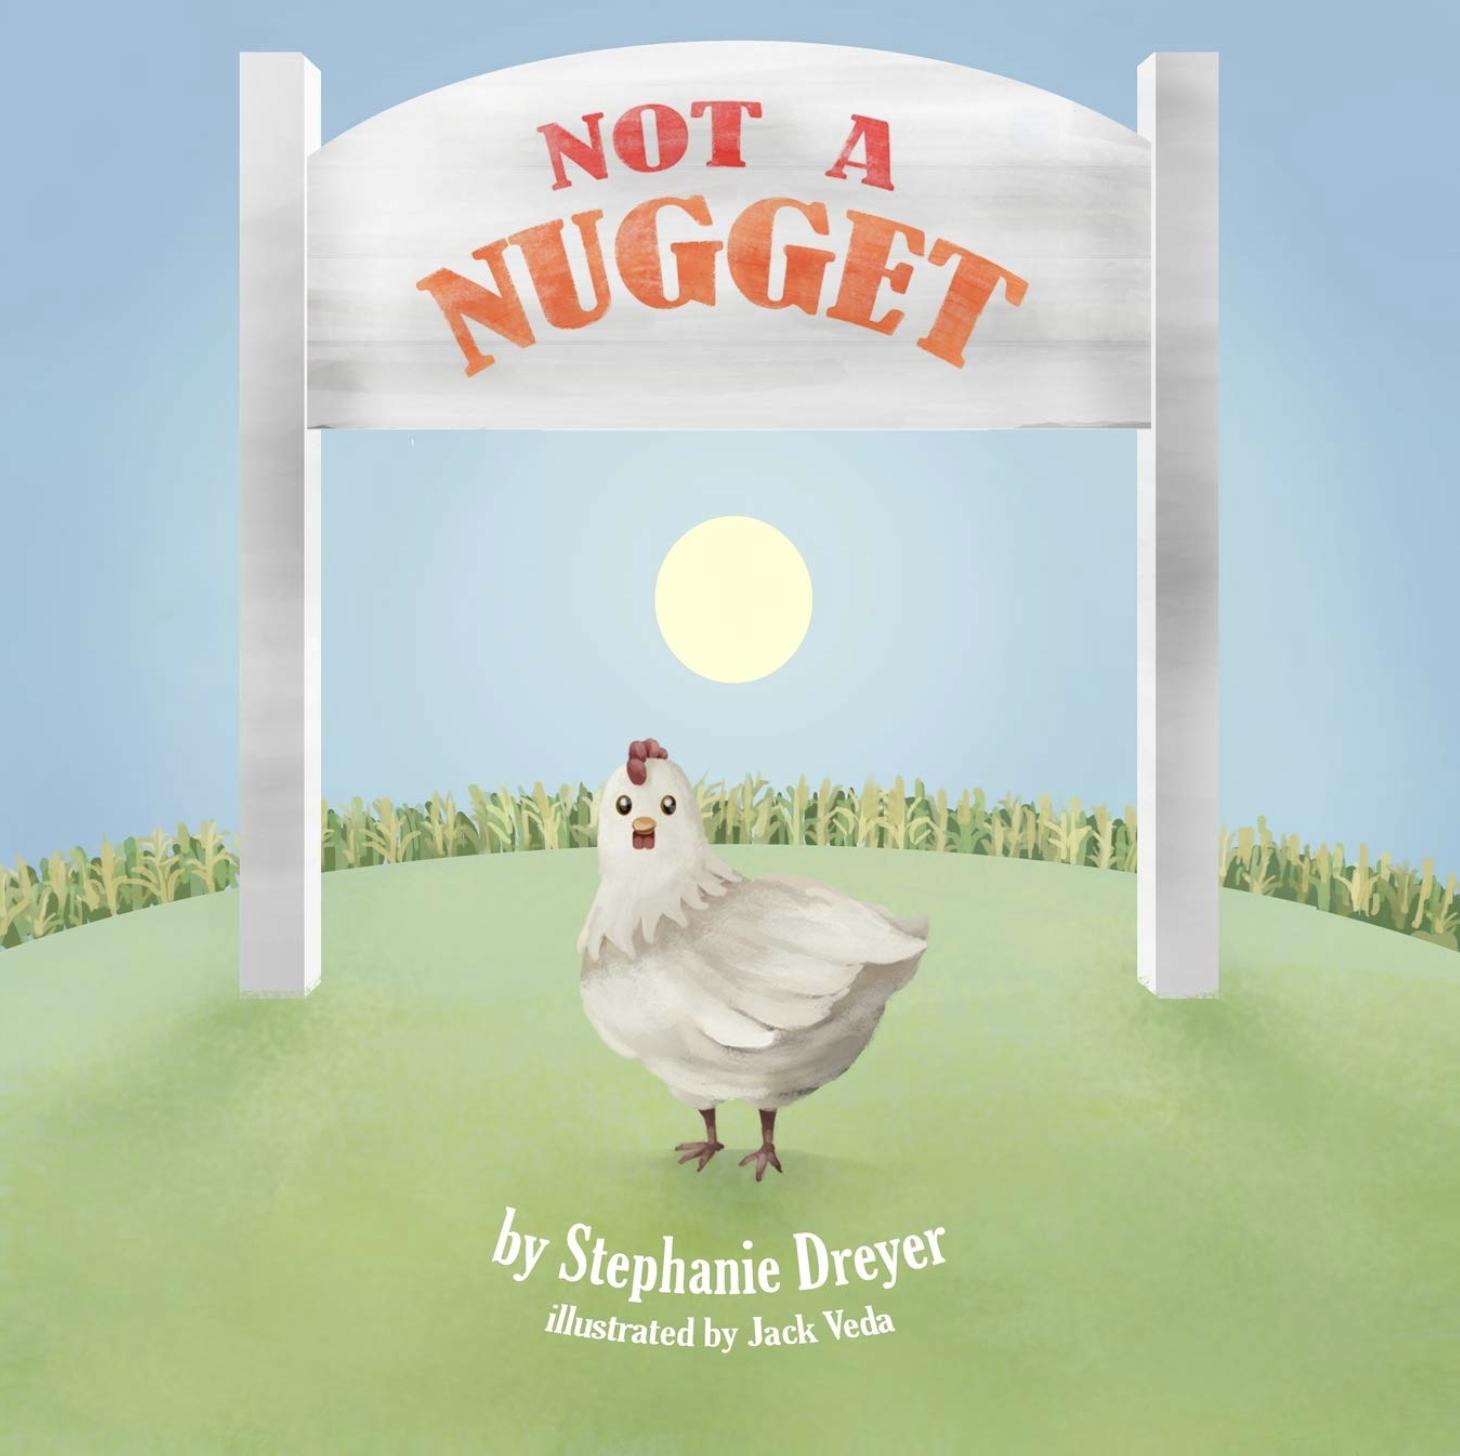 Not a Nugget children's book